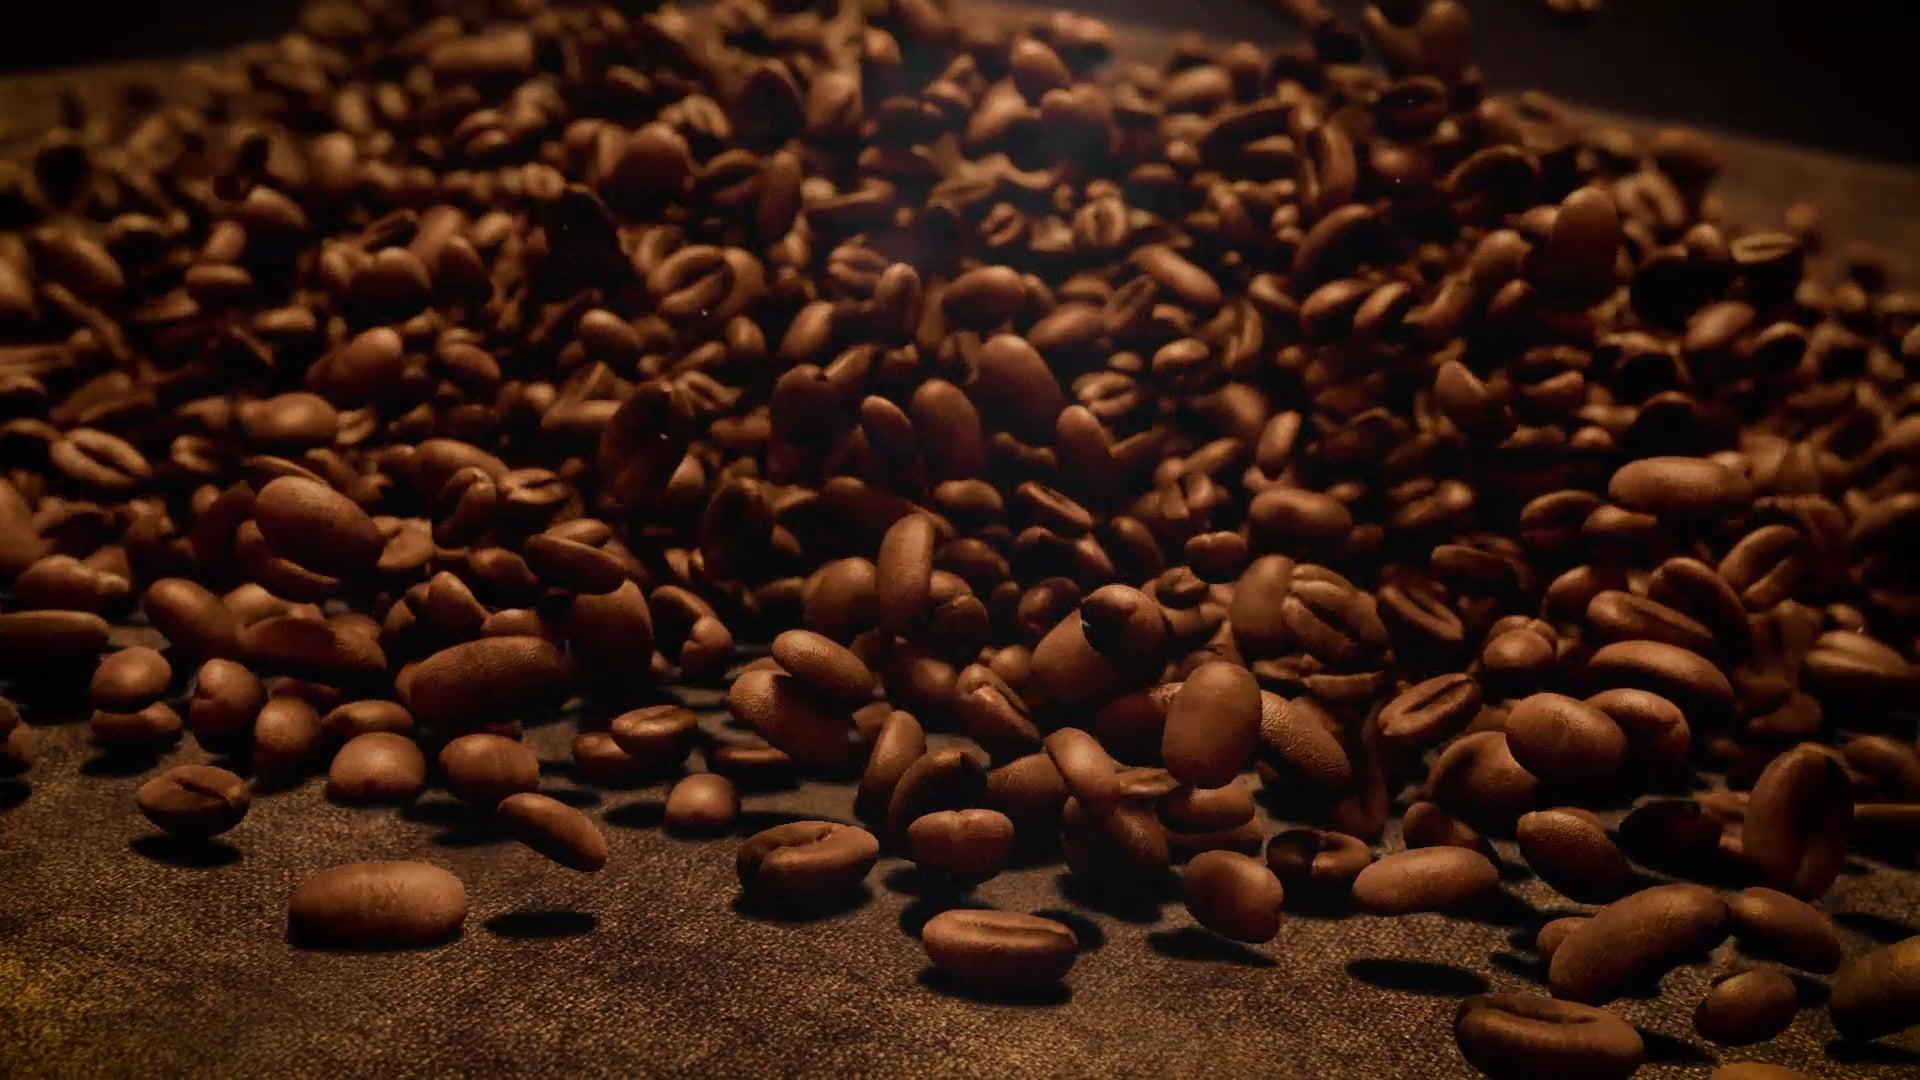 CAFFE' TRE CERI 2018 4minuti